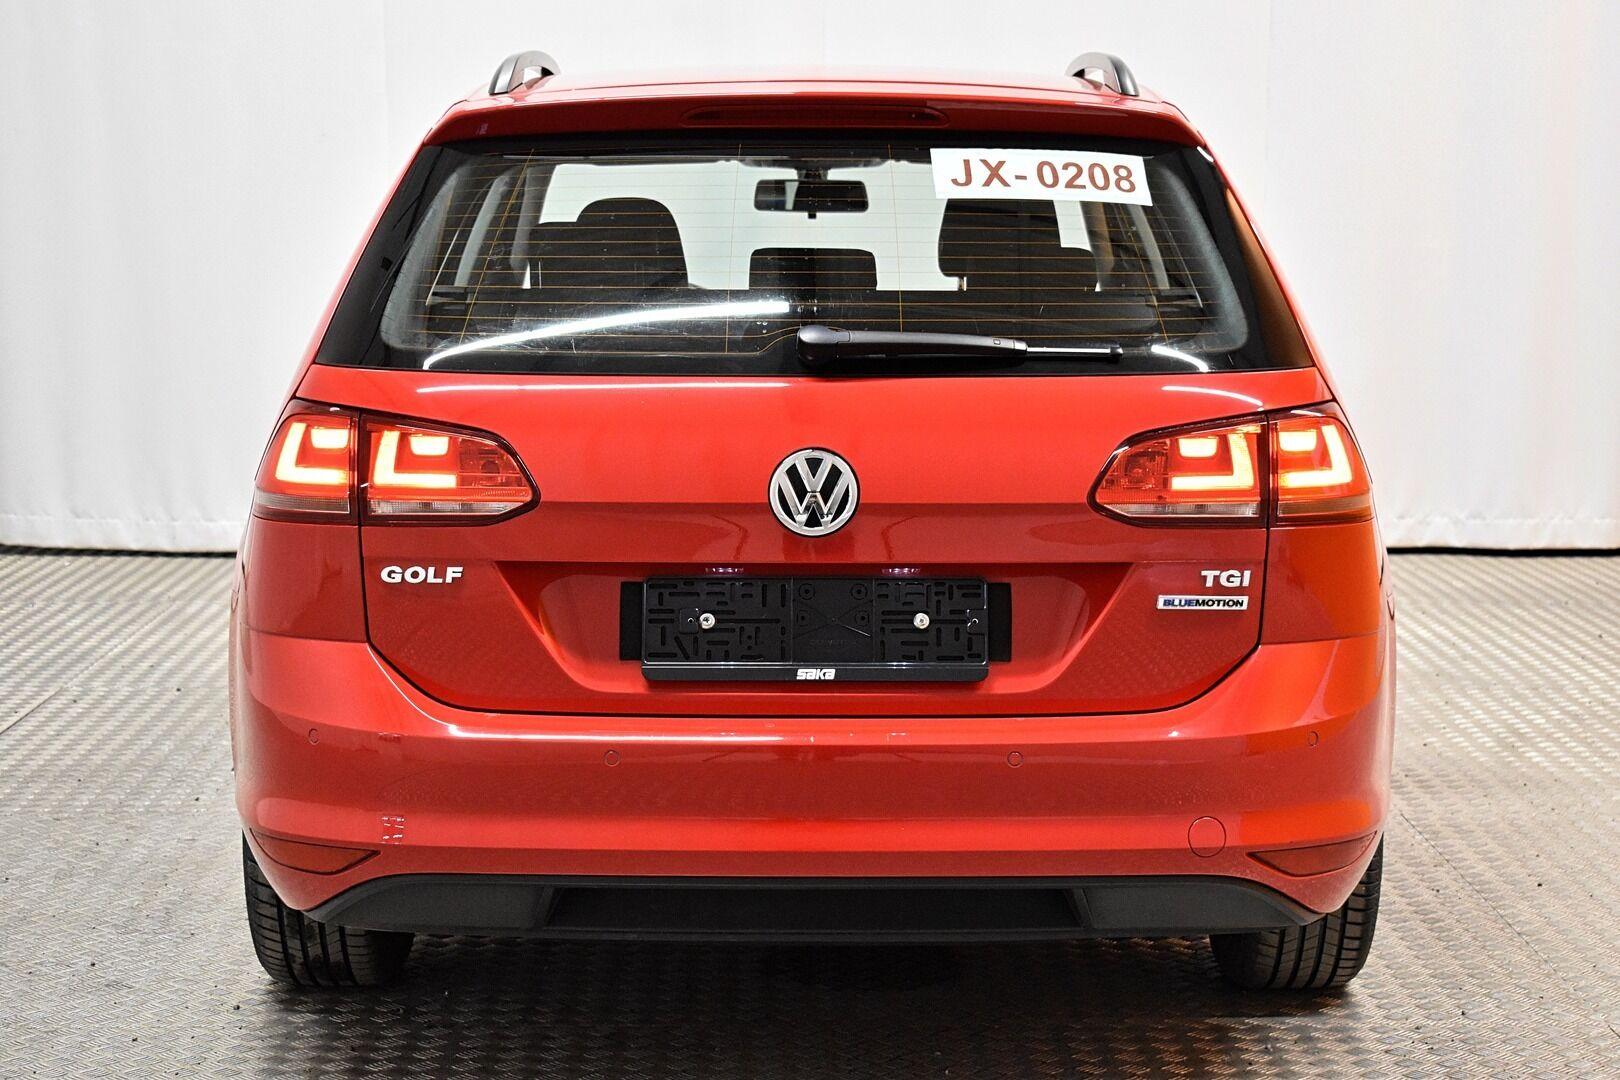 Punainen Farmari, Volkswagen Golf – LEM-79340, kuva 4